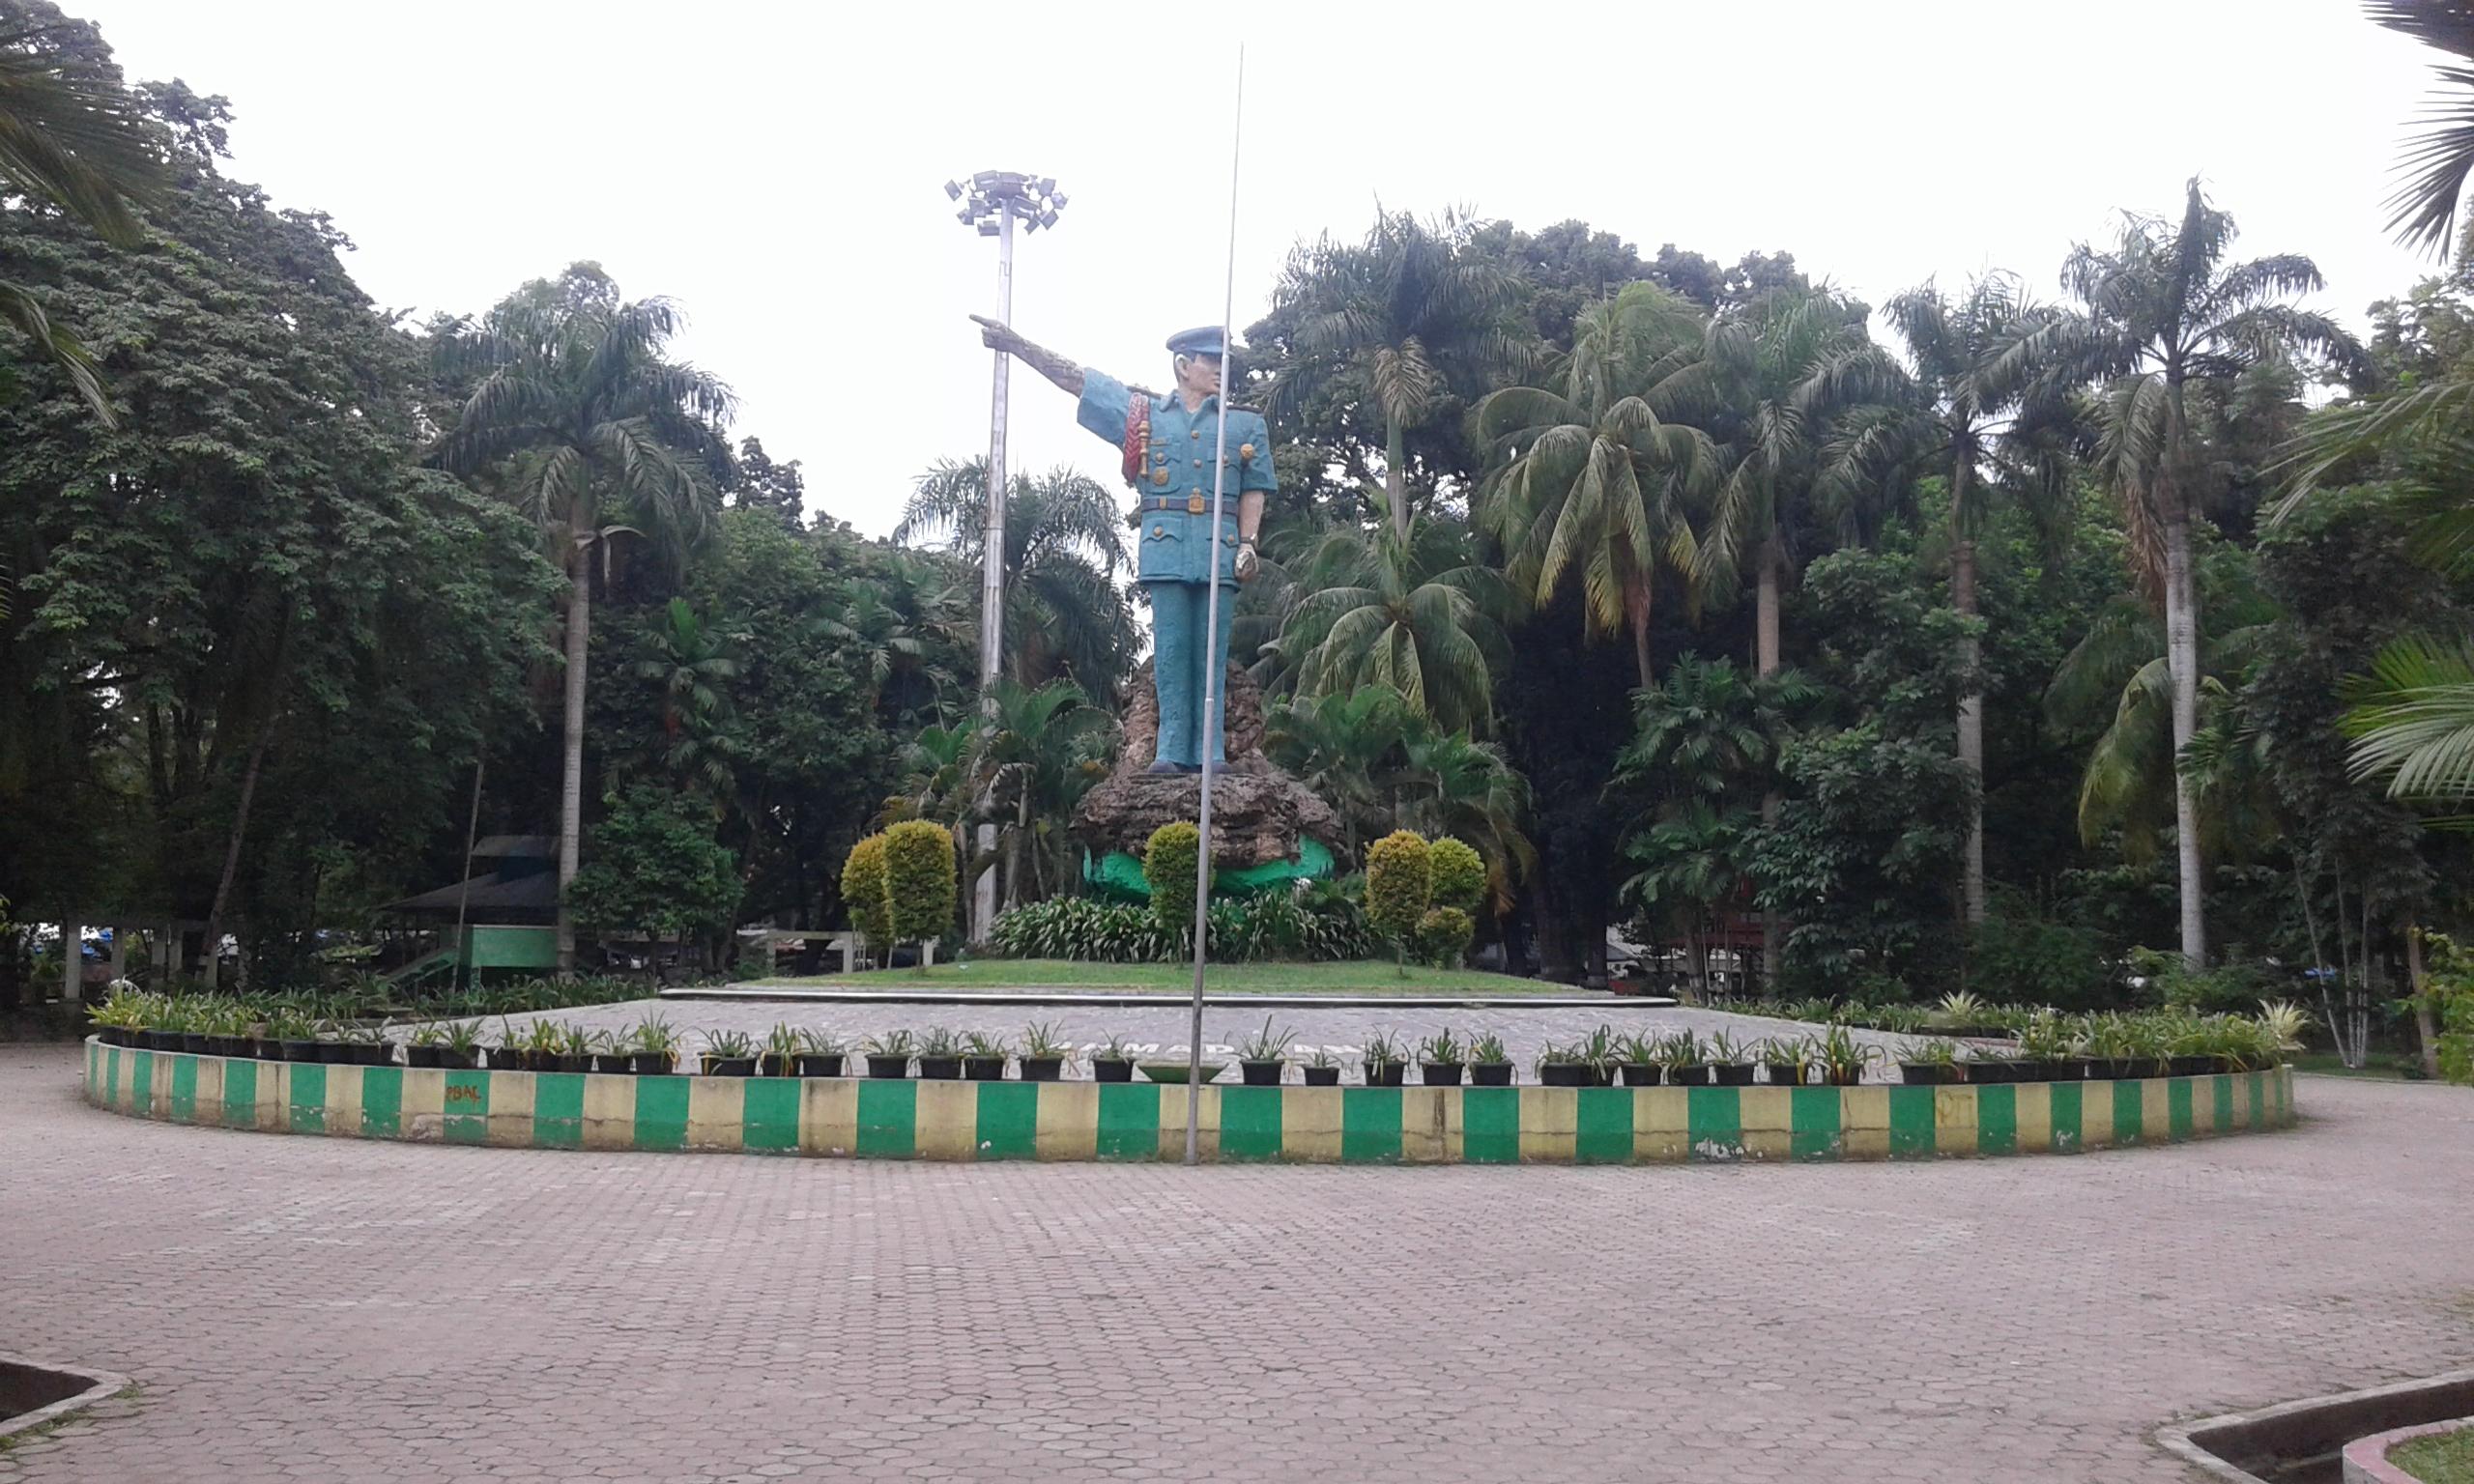 Harapan Tantangan Ruang Publik Kota Medan Oleh Fd Tanjung Patung